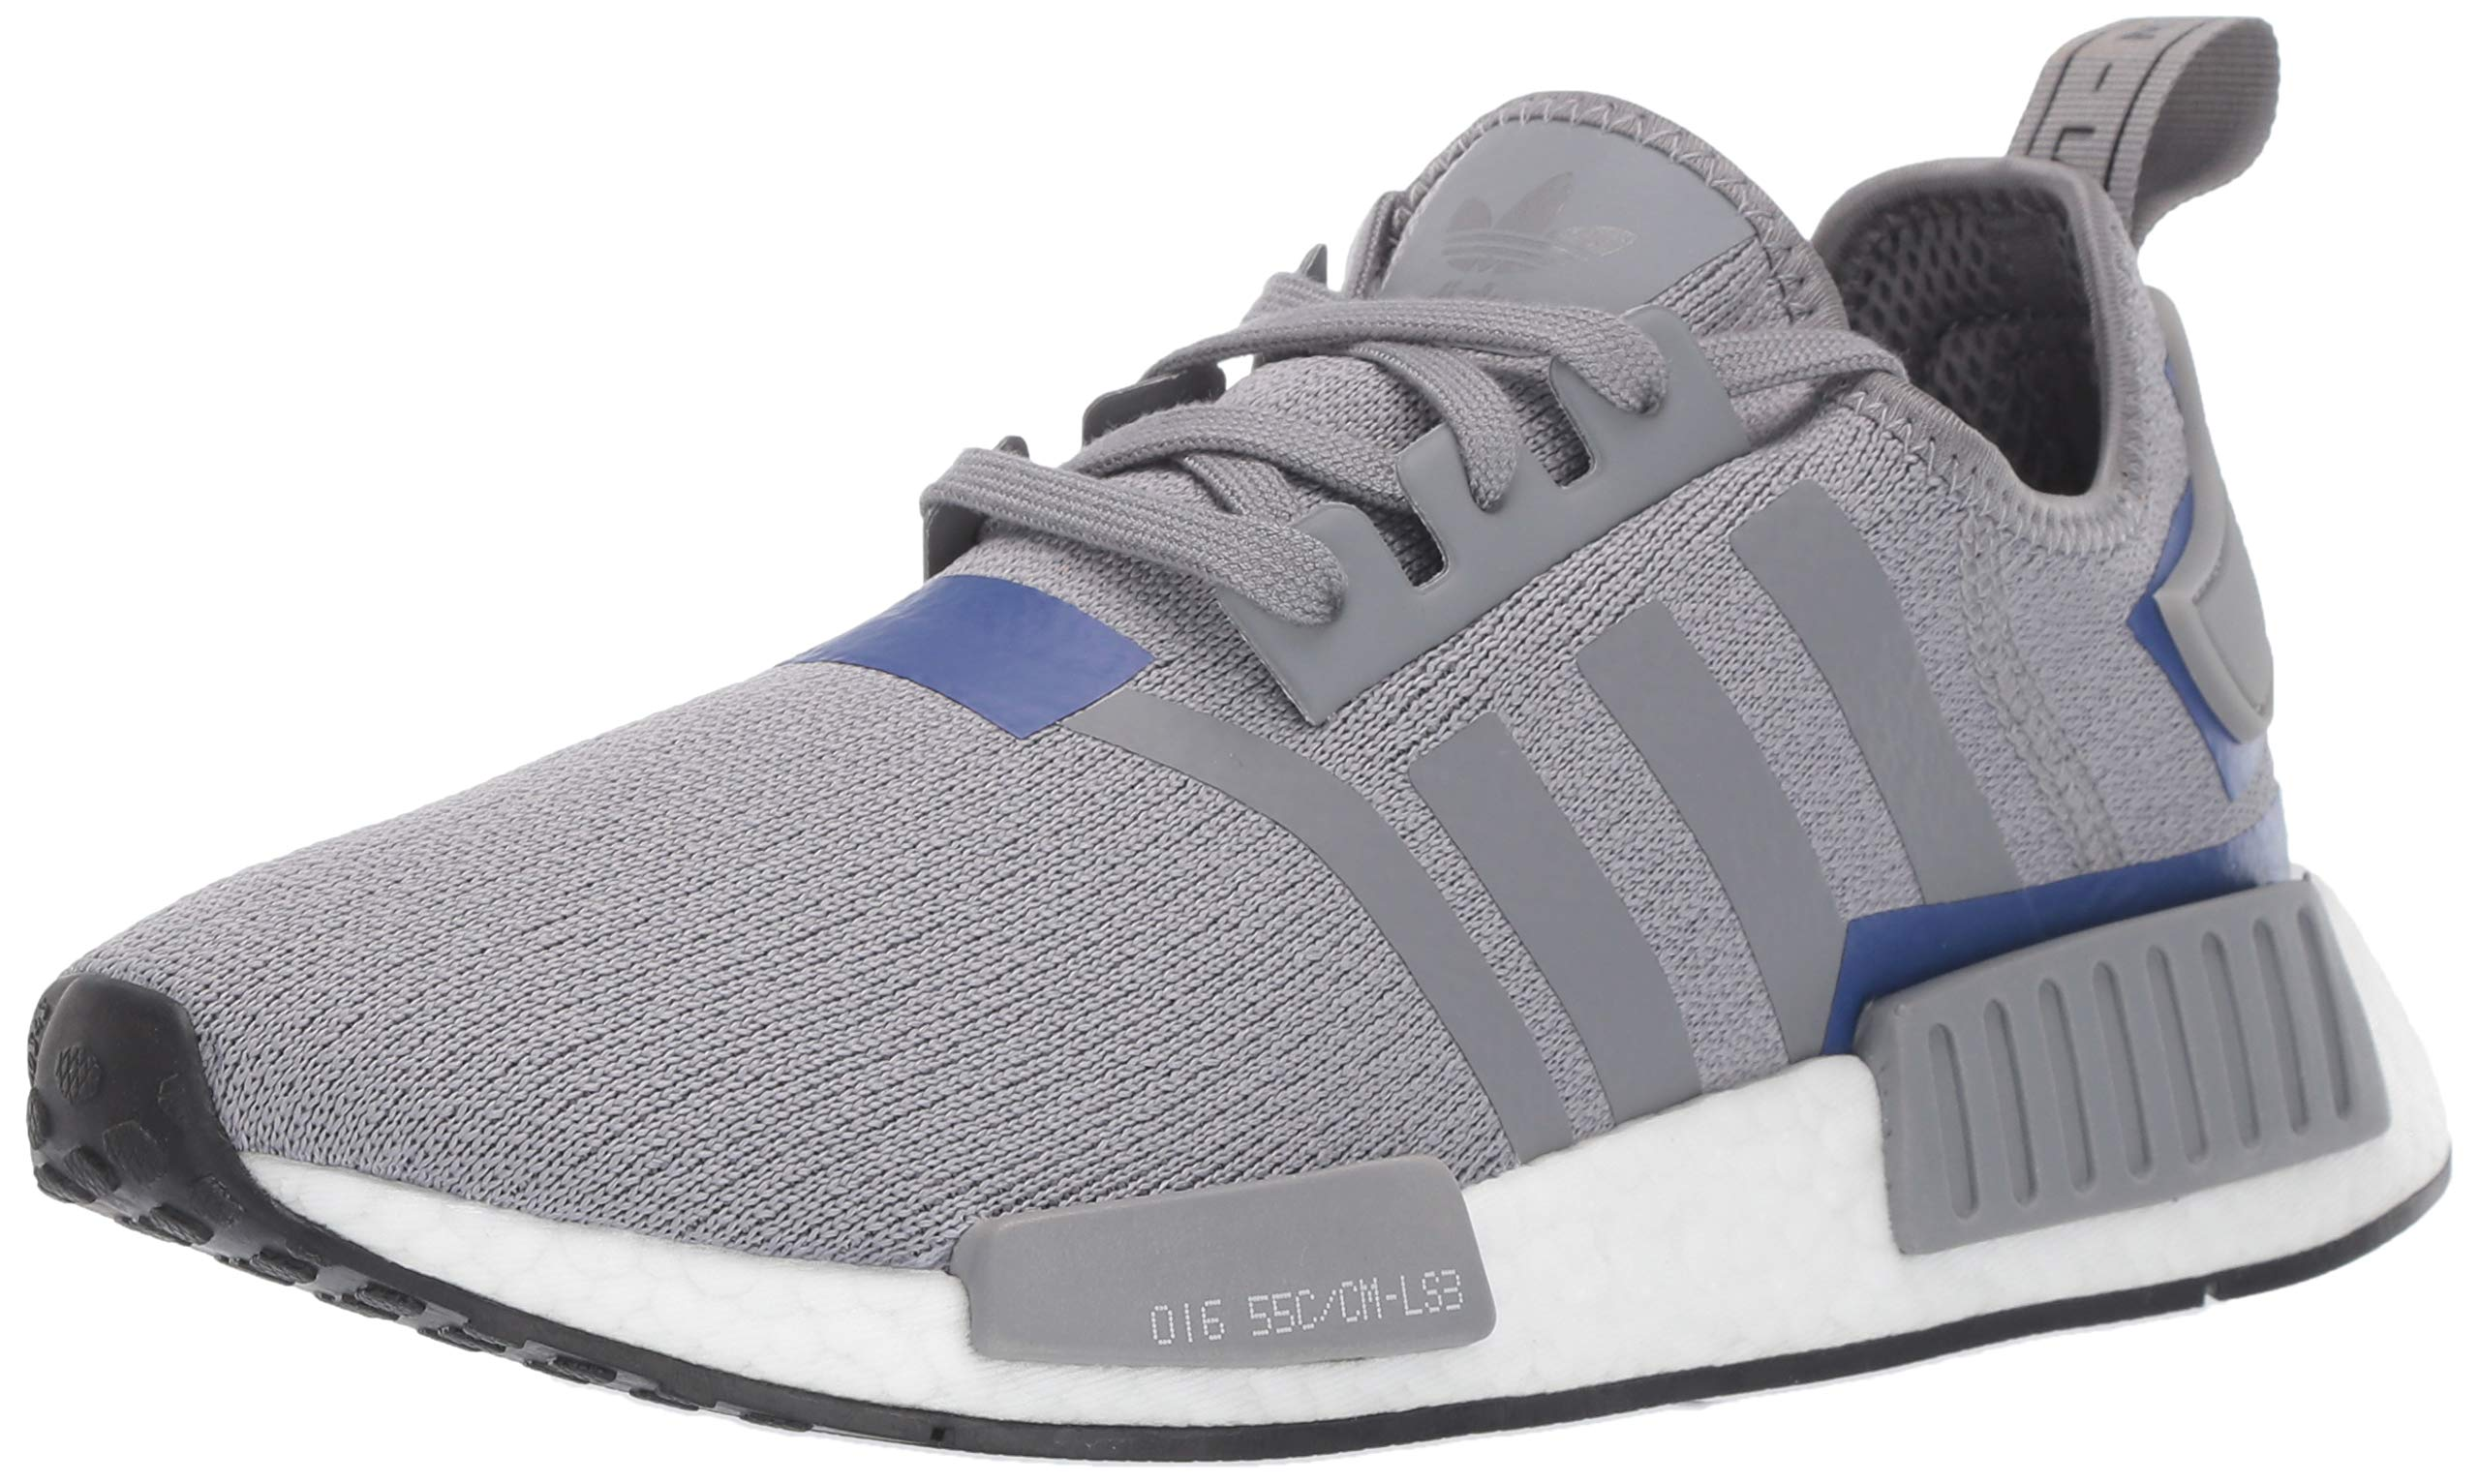 adidas Originals Men's NMD_R1 Running Shoe Grey/Active Blue, 4 M US